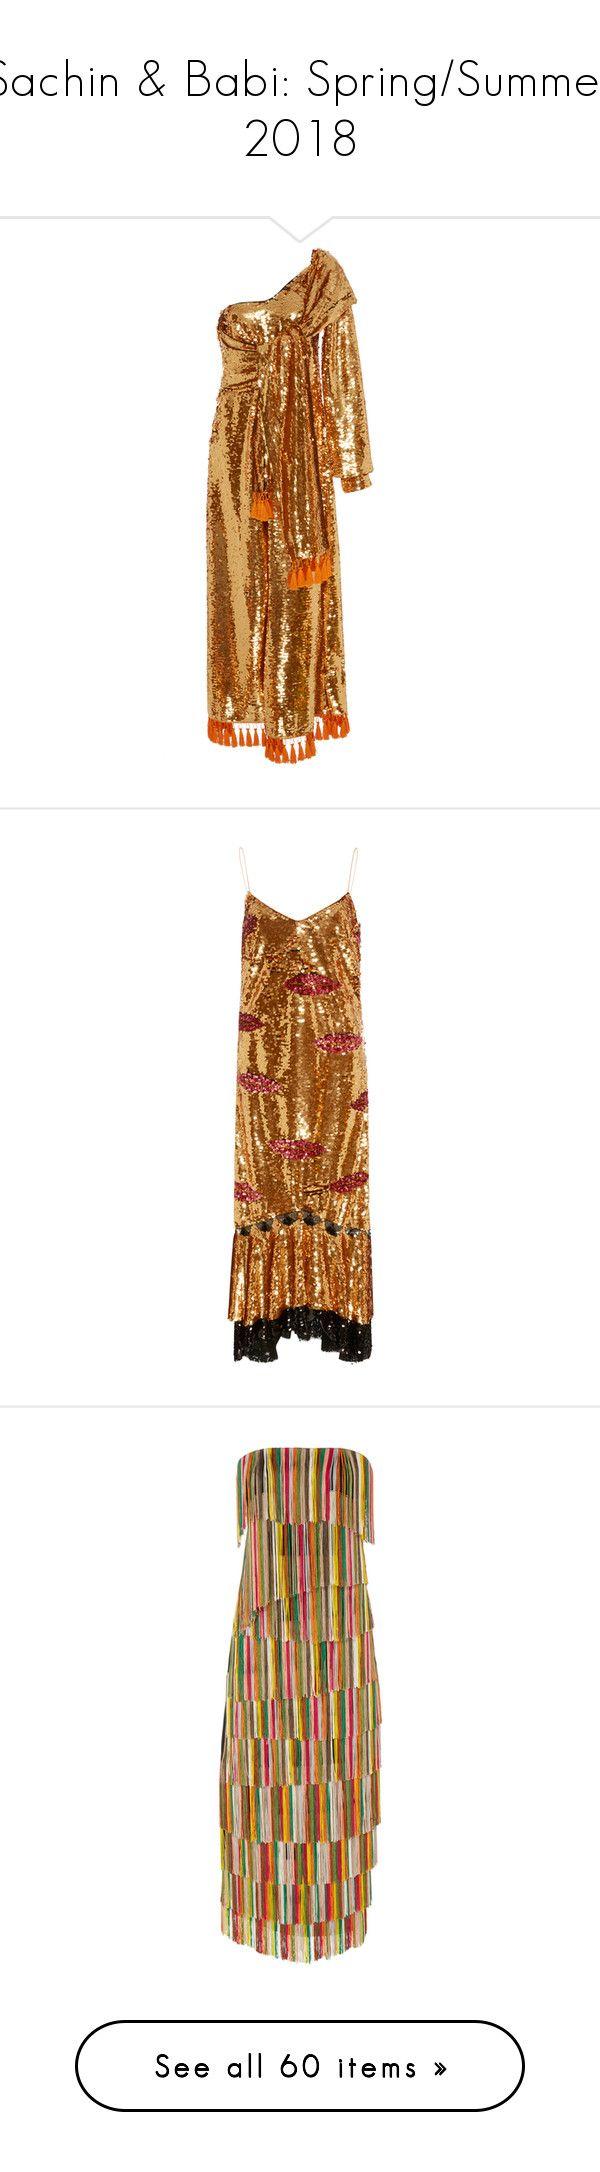 """Sachin & Babi: Spring/Summer 2018"" by livnd ❤ liked on Polyvore featuring SACHINANDBABI, livndfashion, livndsachinandbabi, springsummer2018, dresses, midi dress, one sleeve cocktail dress, off one shoulder dress, one shoulder dress and one shoulder sequin dress"